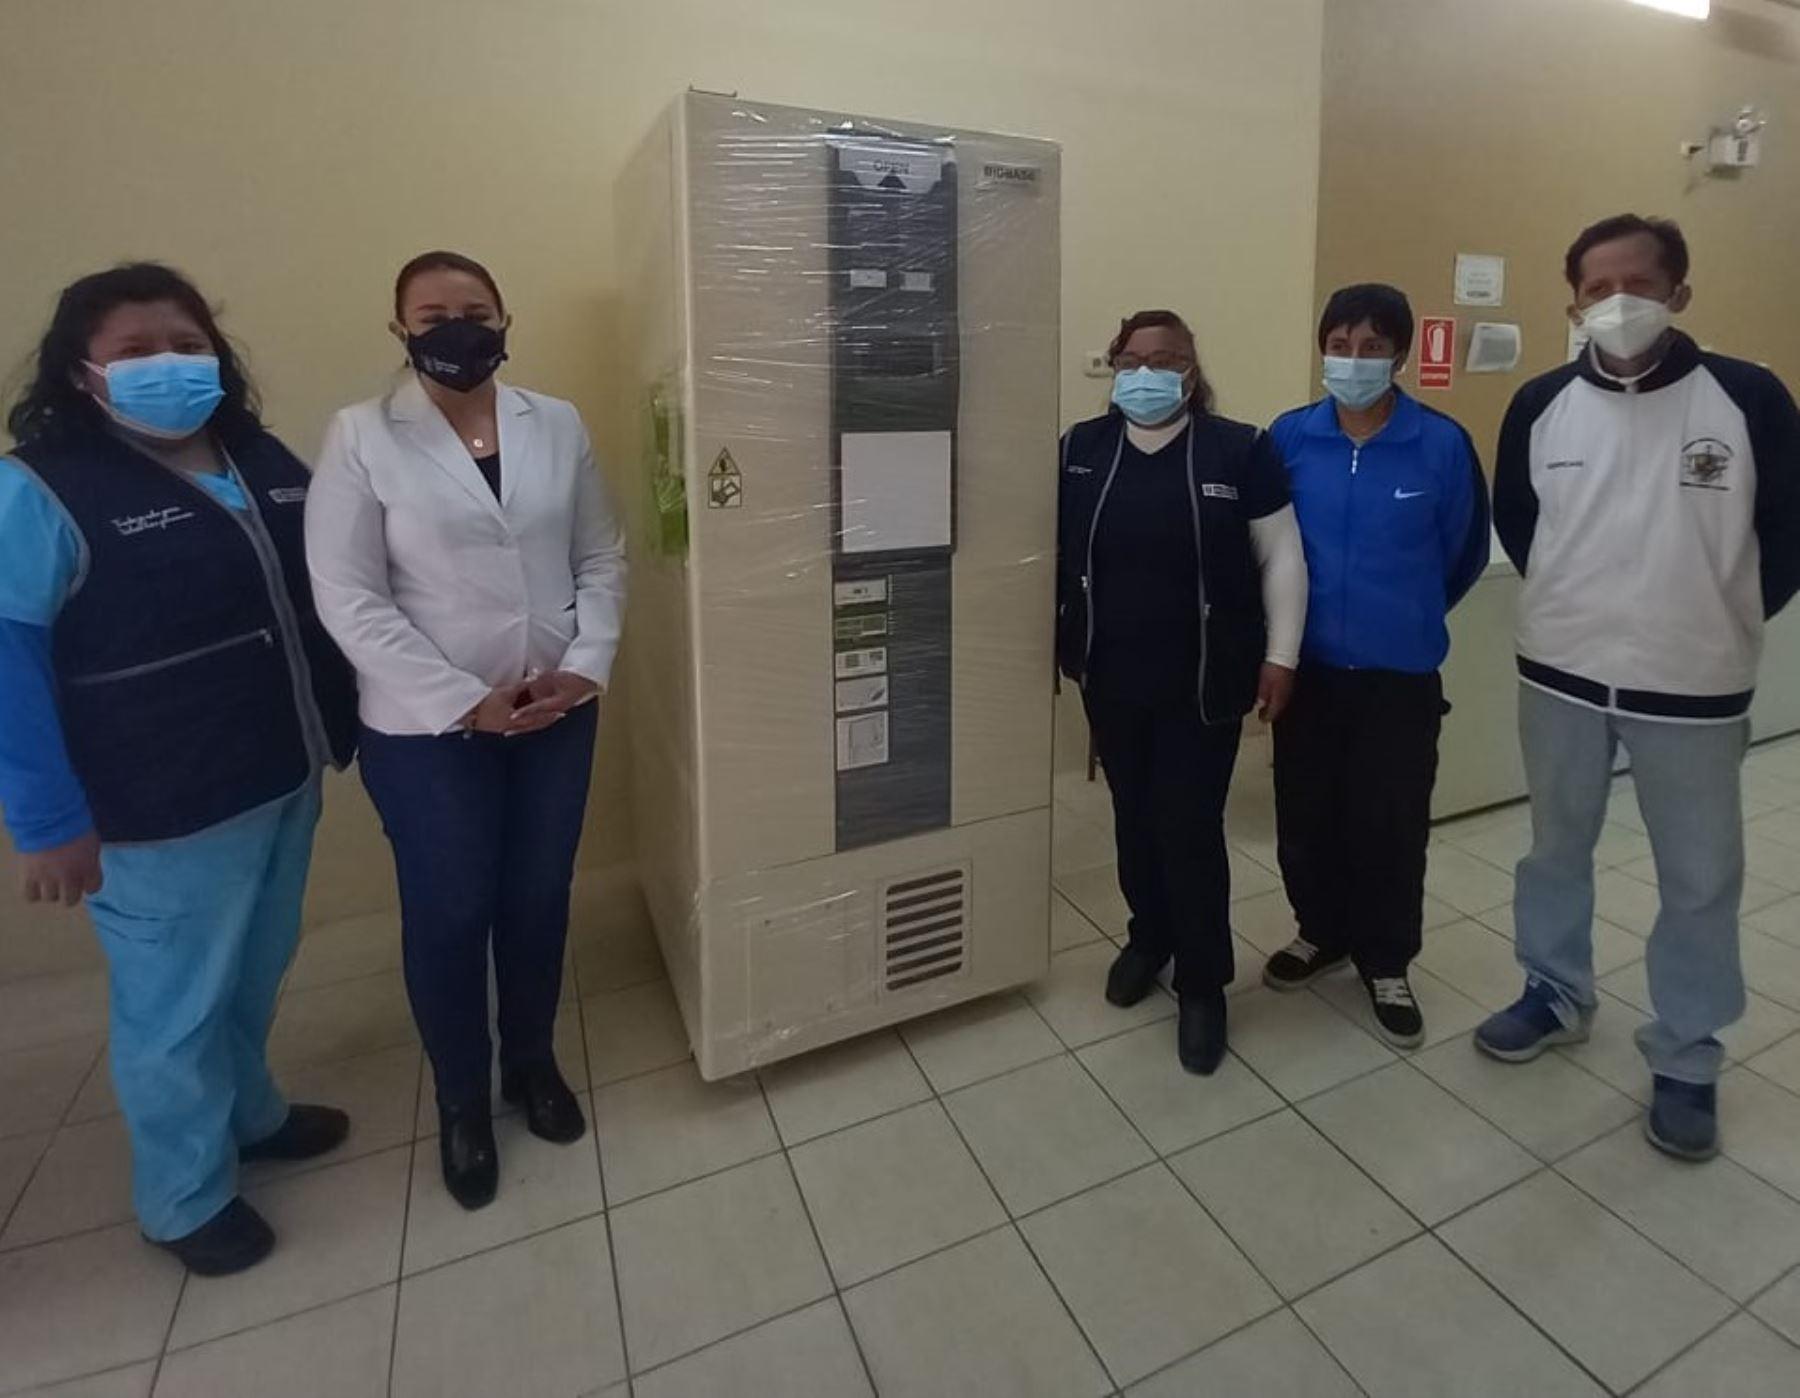 La Libertad: OPS dona ultracongeladora para conservar vacunas contra el covid-19